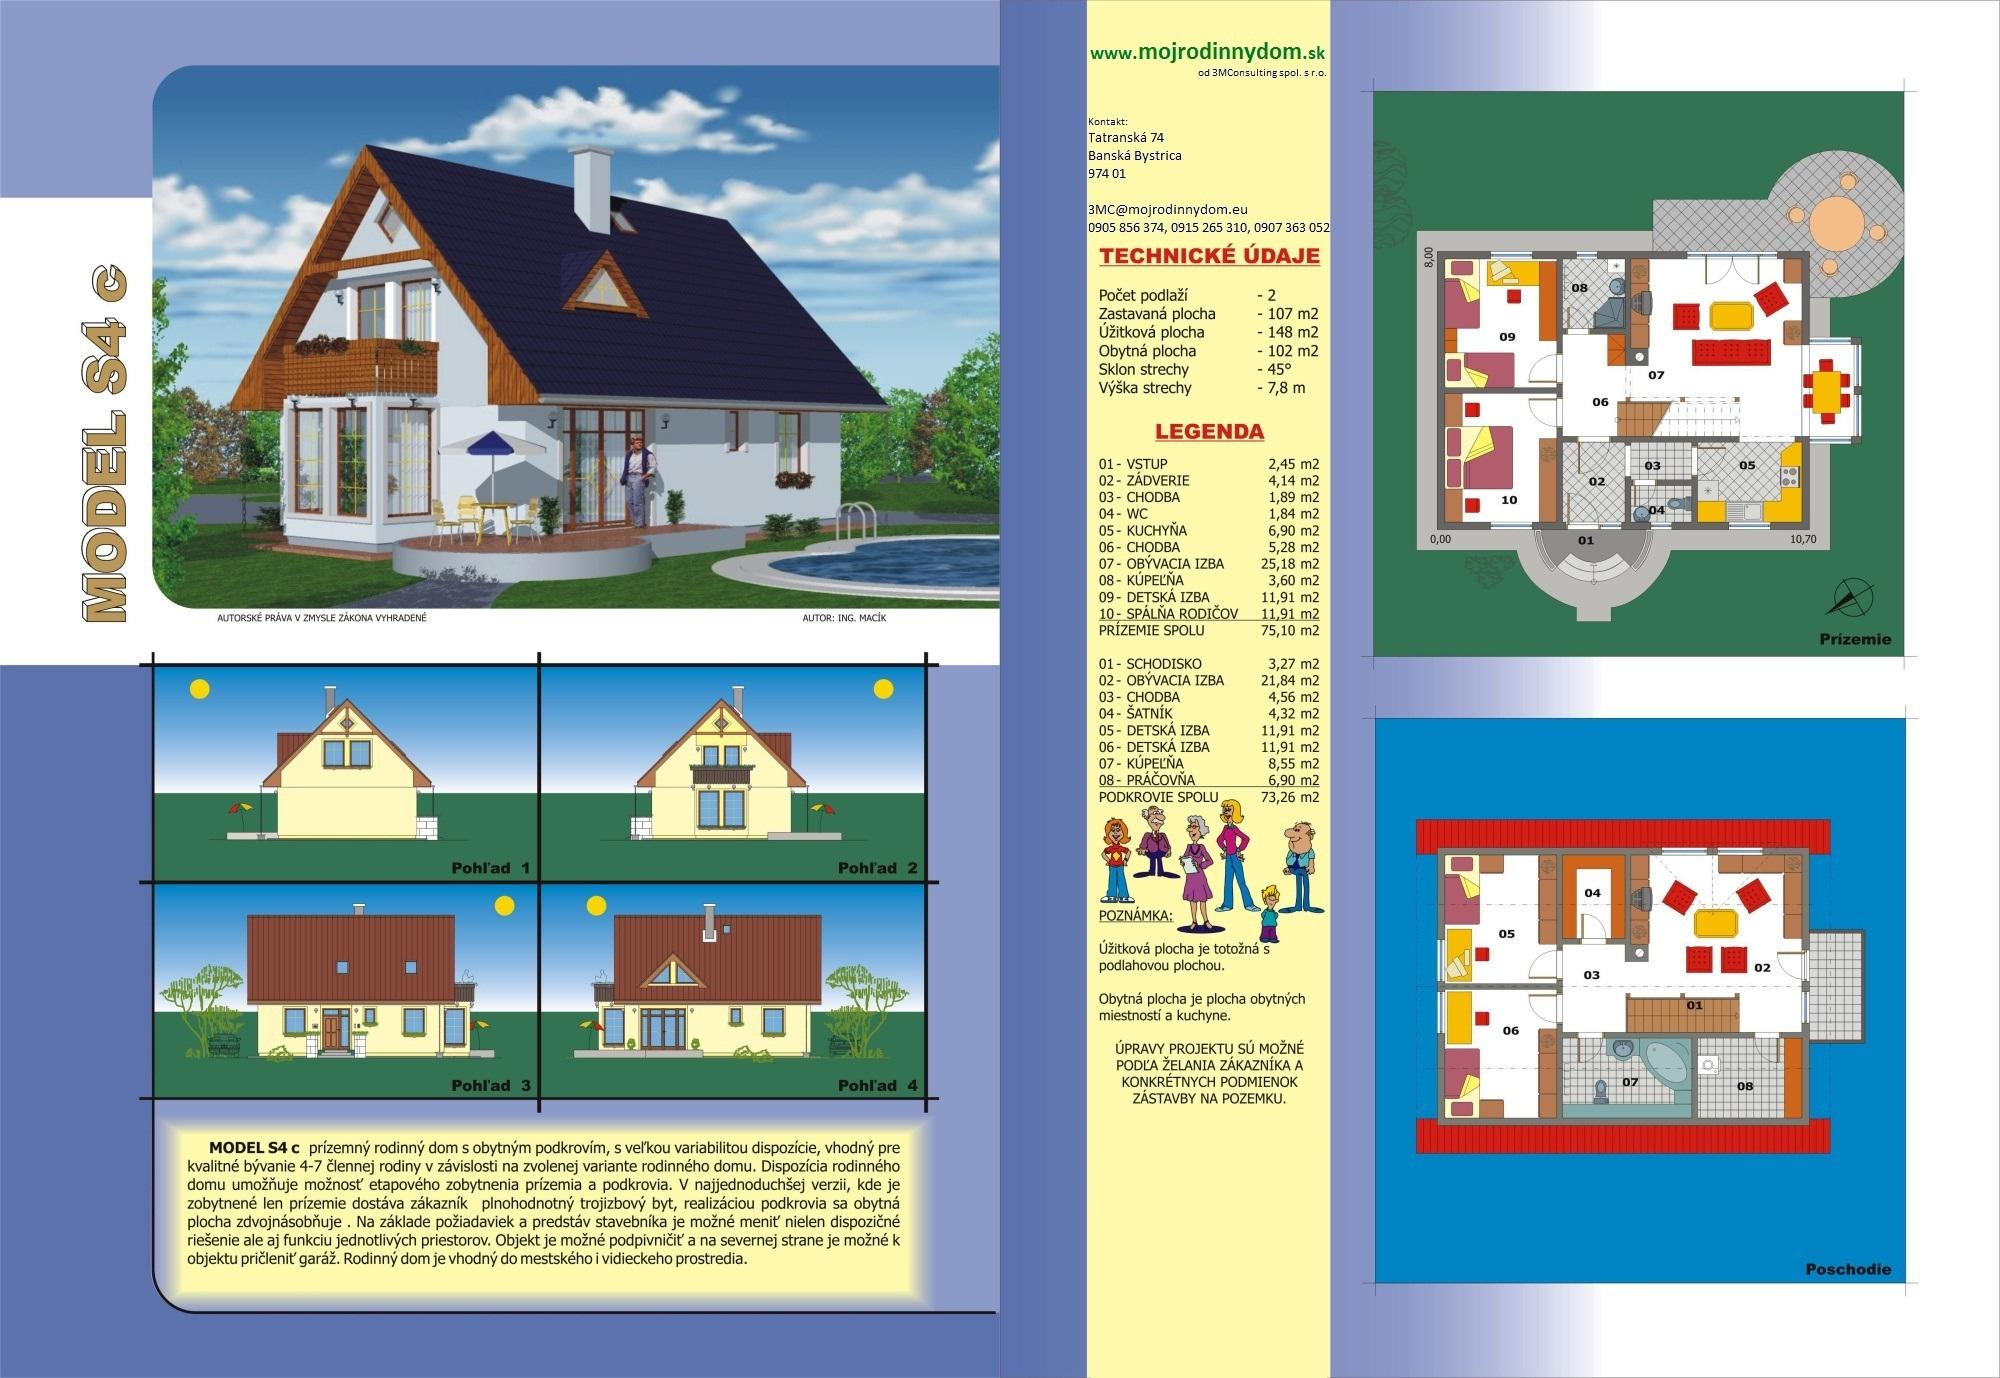 projekt stredne veľkého rodinného domu  xs4c